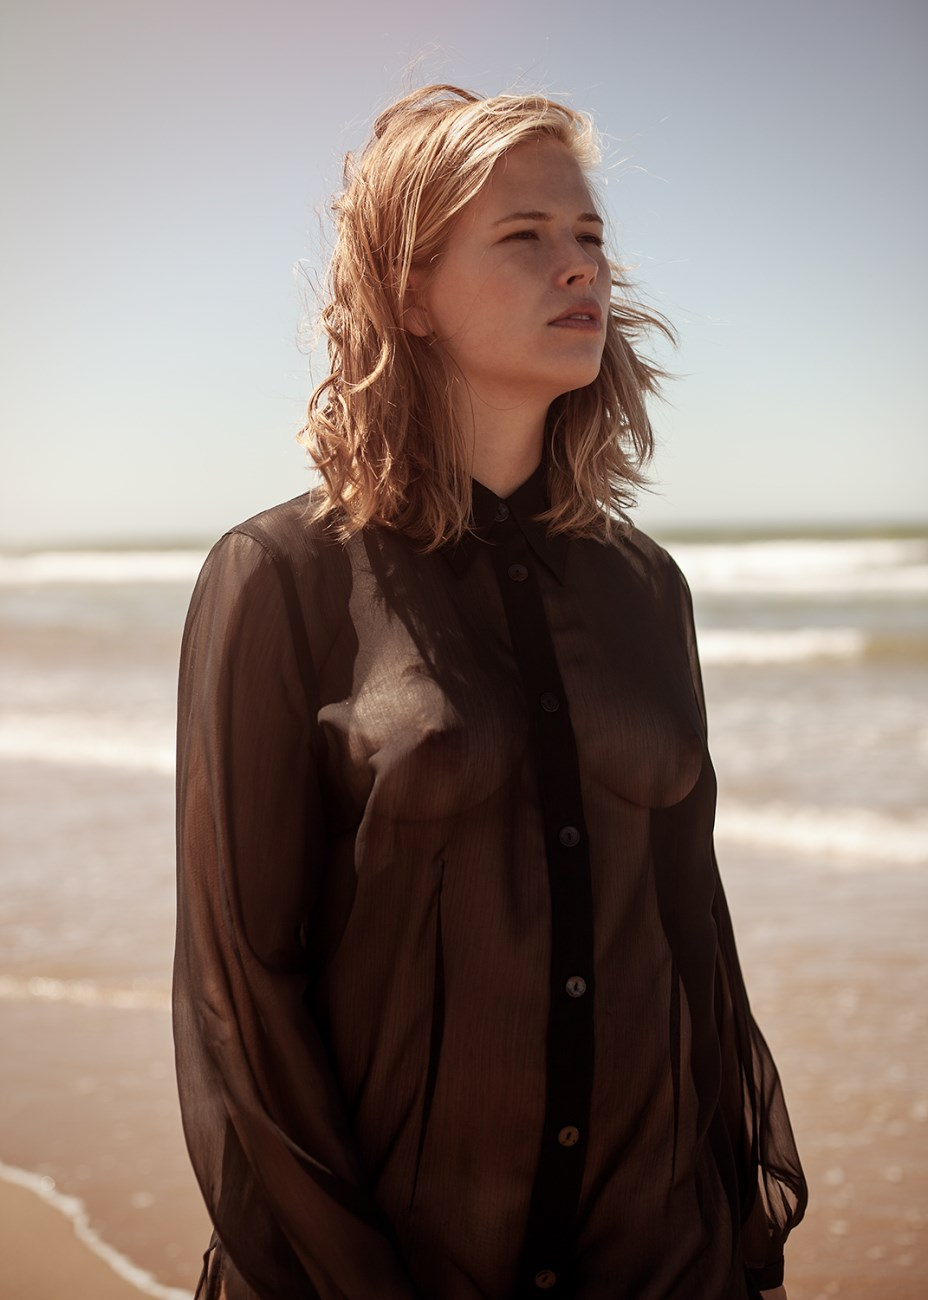 Model: Daphne van Drenth